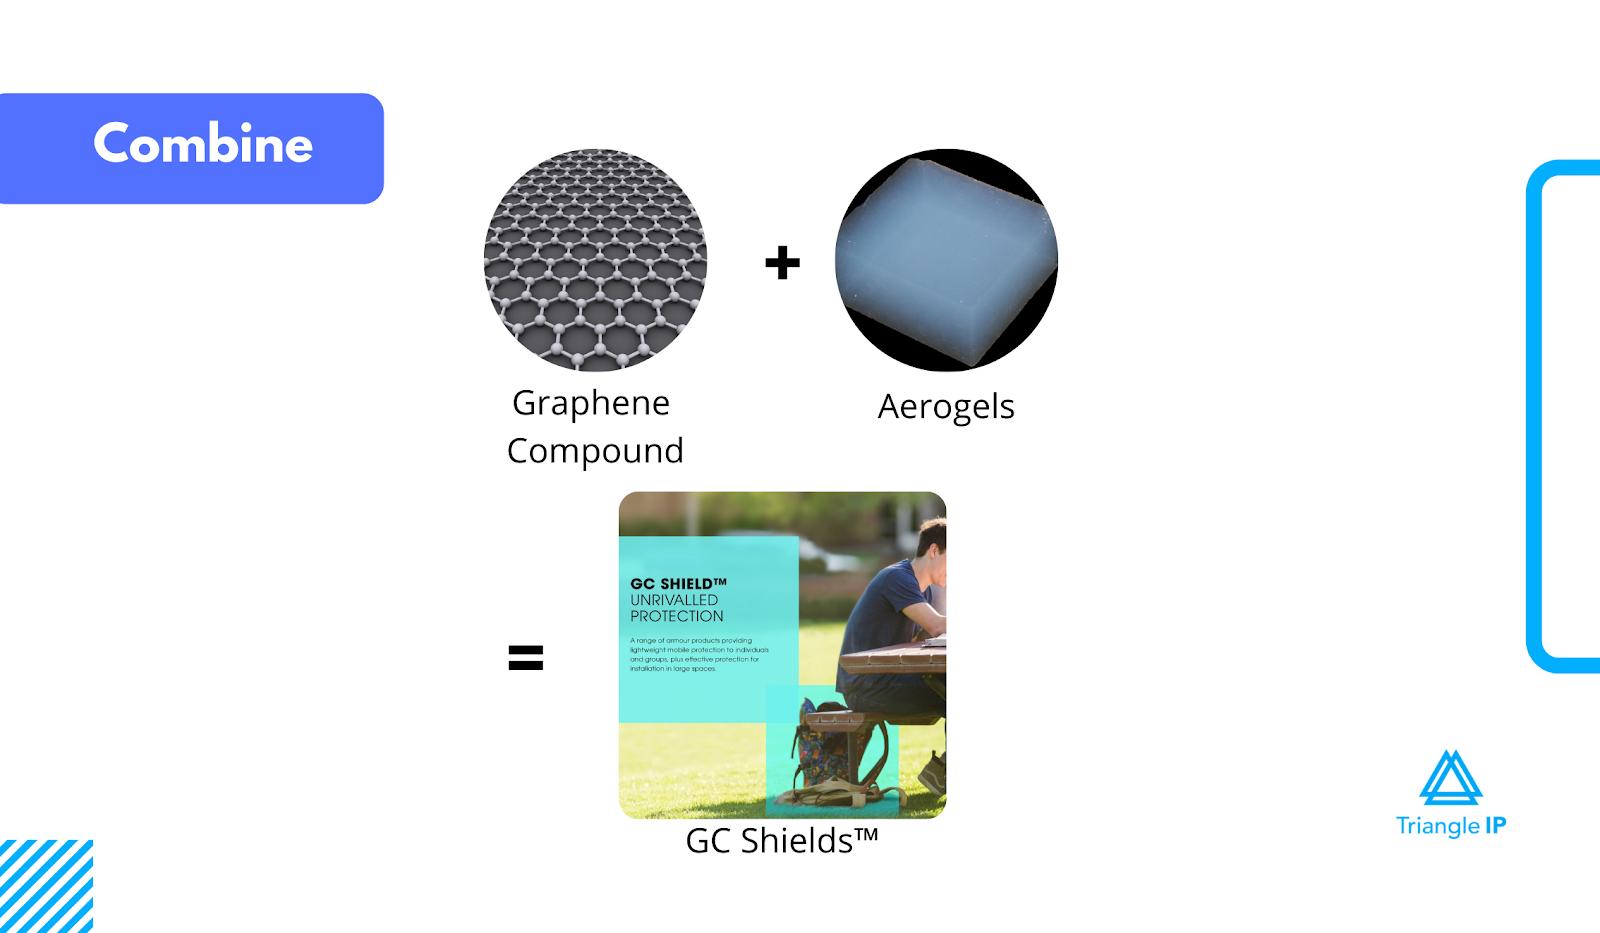 Innovations in Aerogel - Combine - Graphene Composites